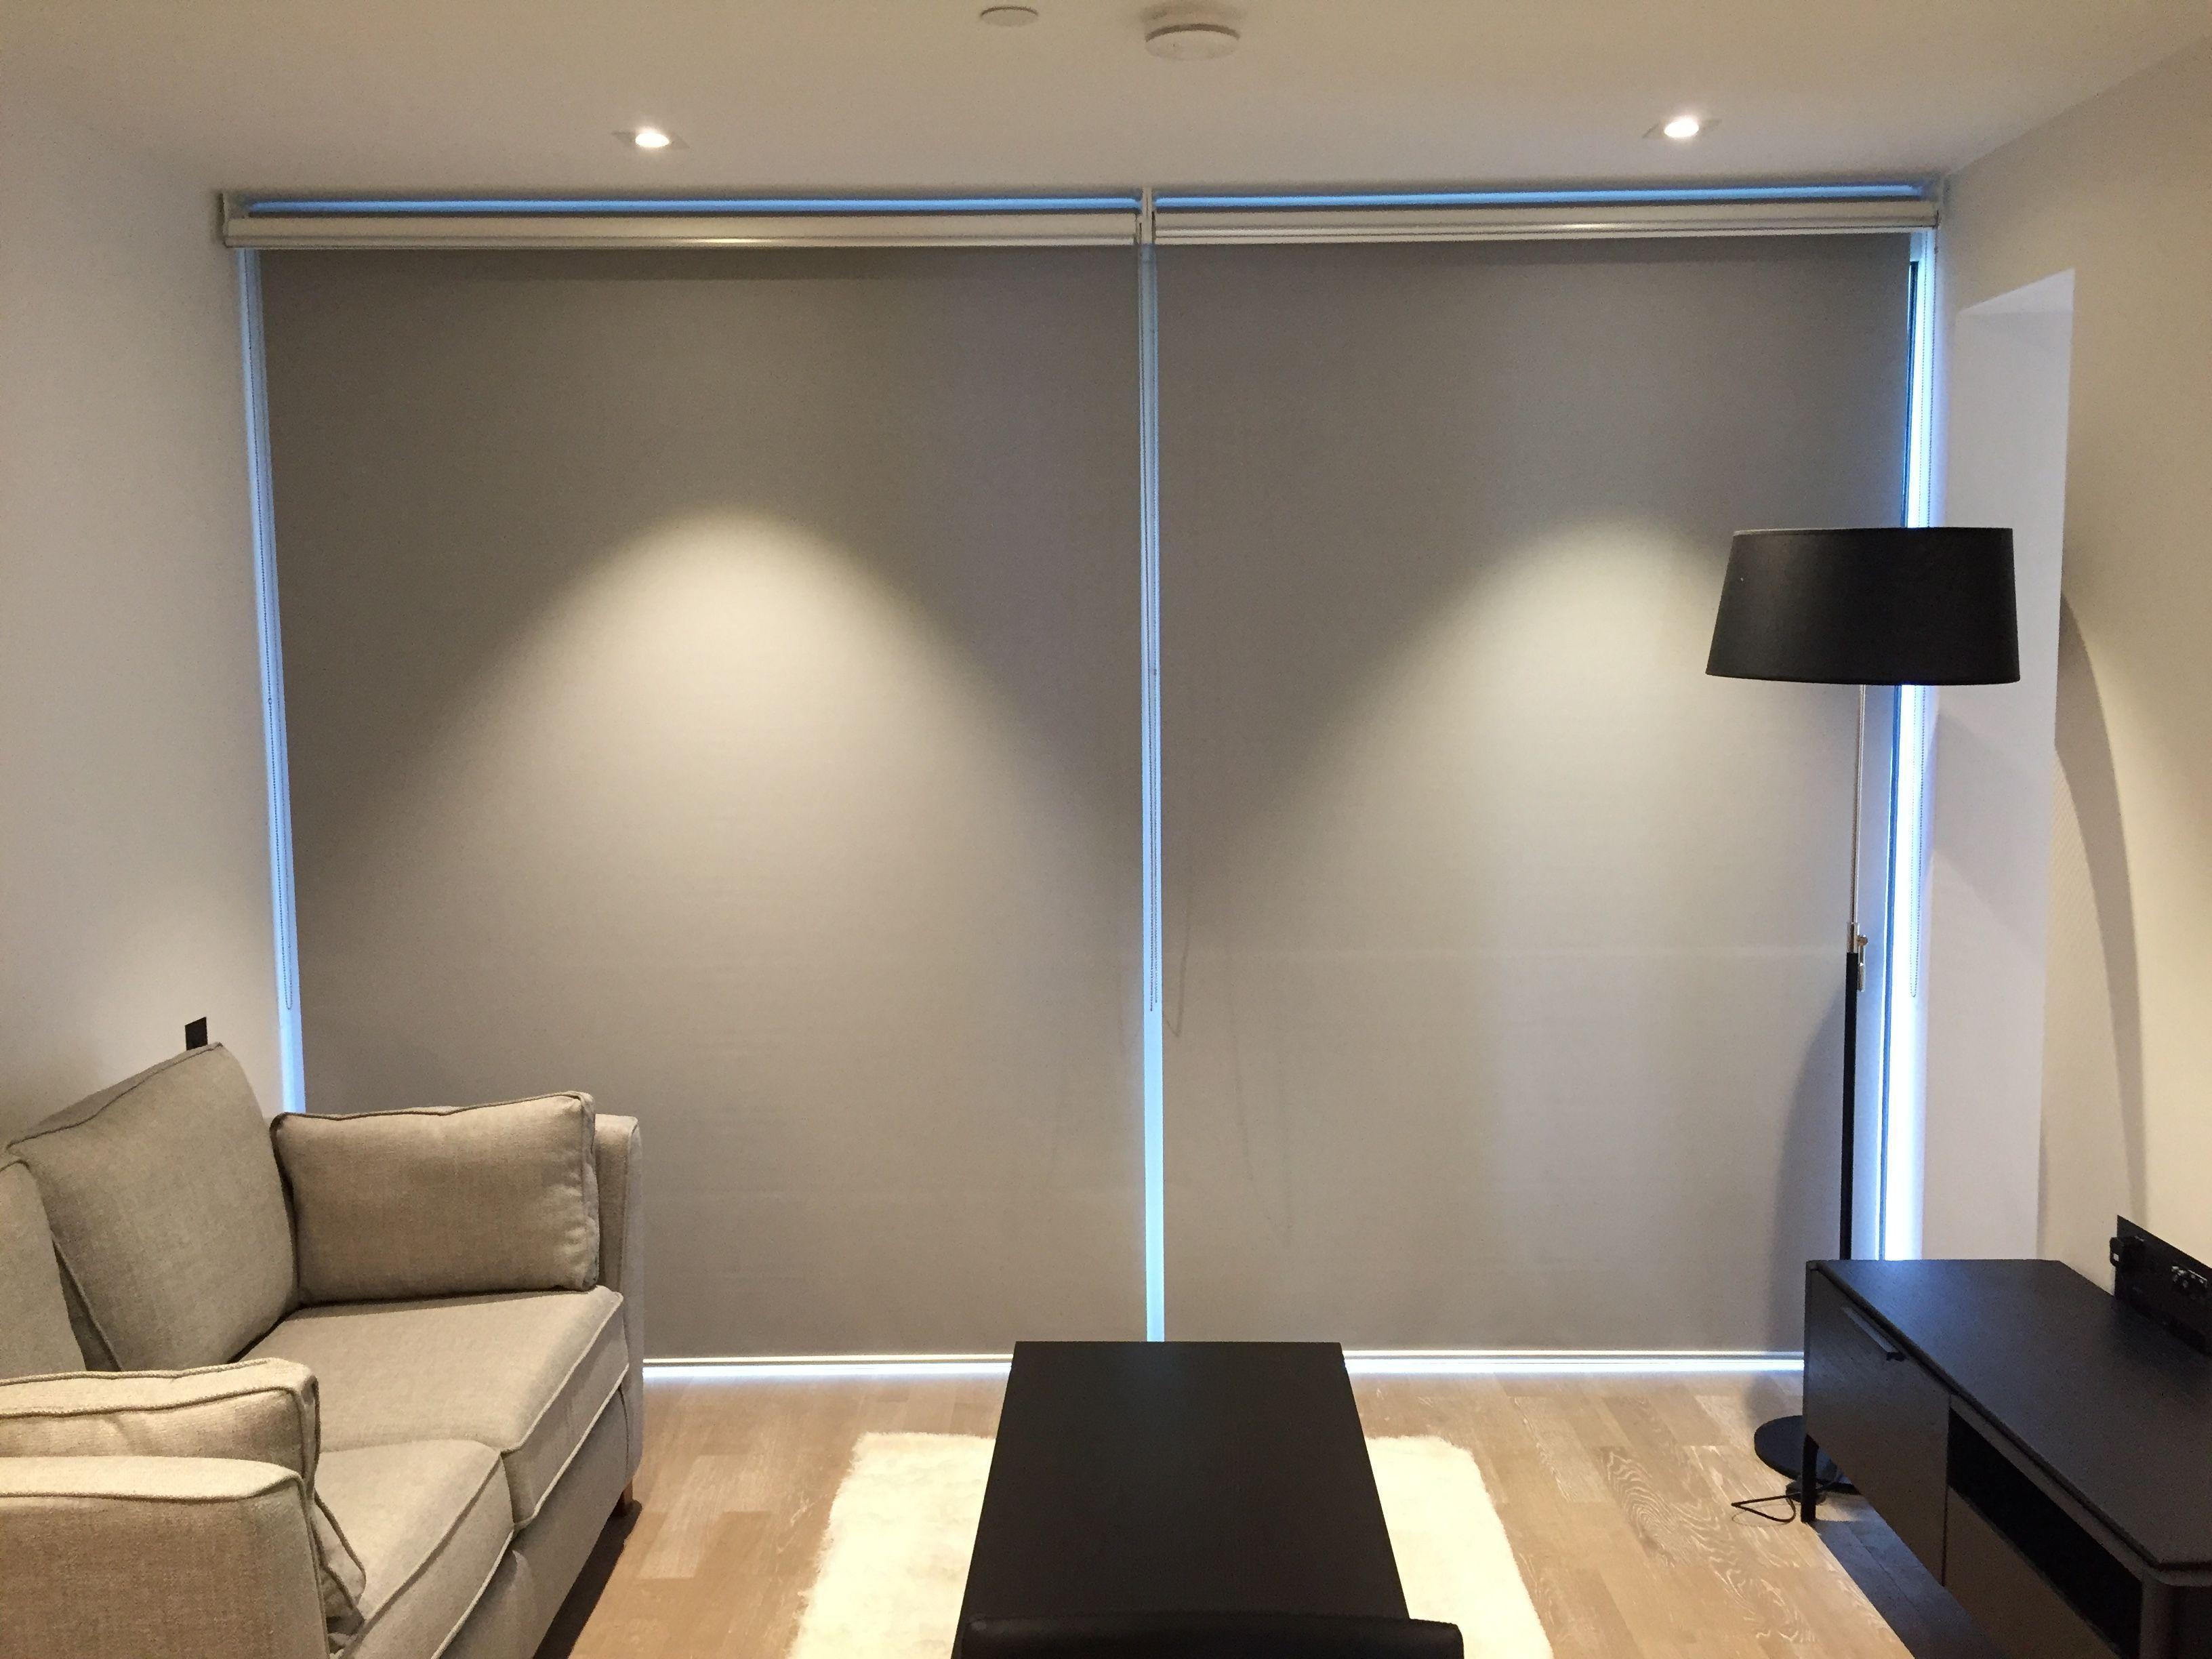 Doubledual roller blinds showing the blackout roller blind down